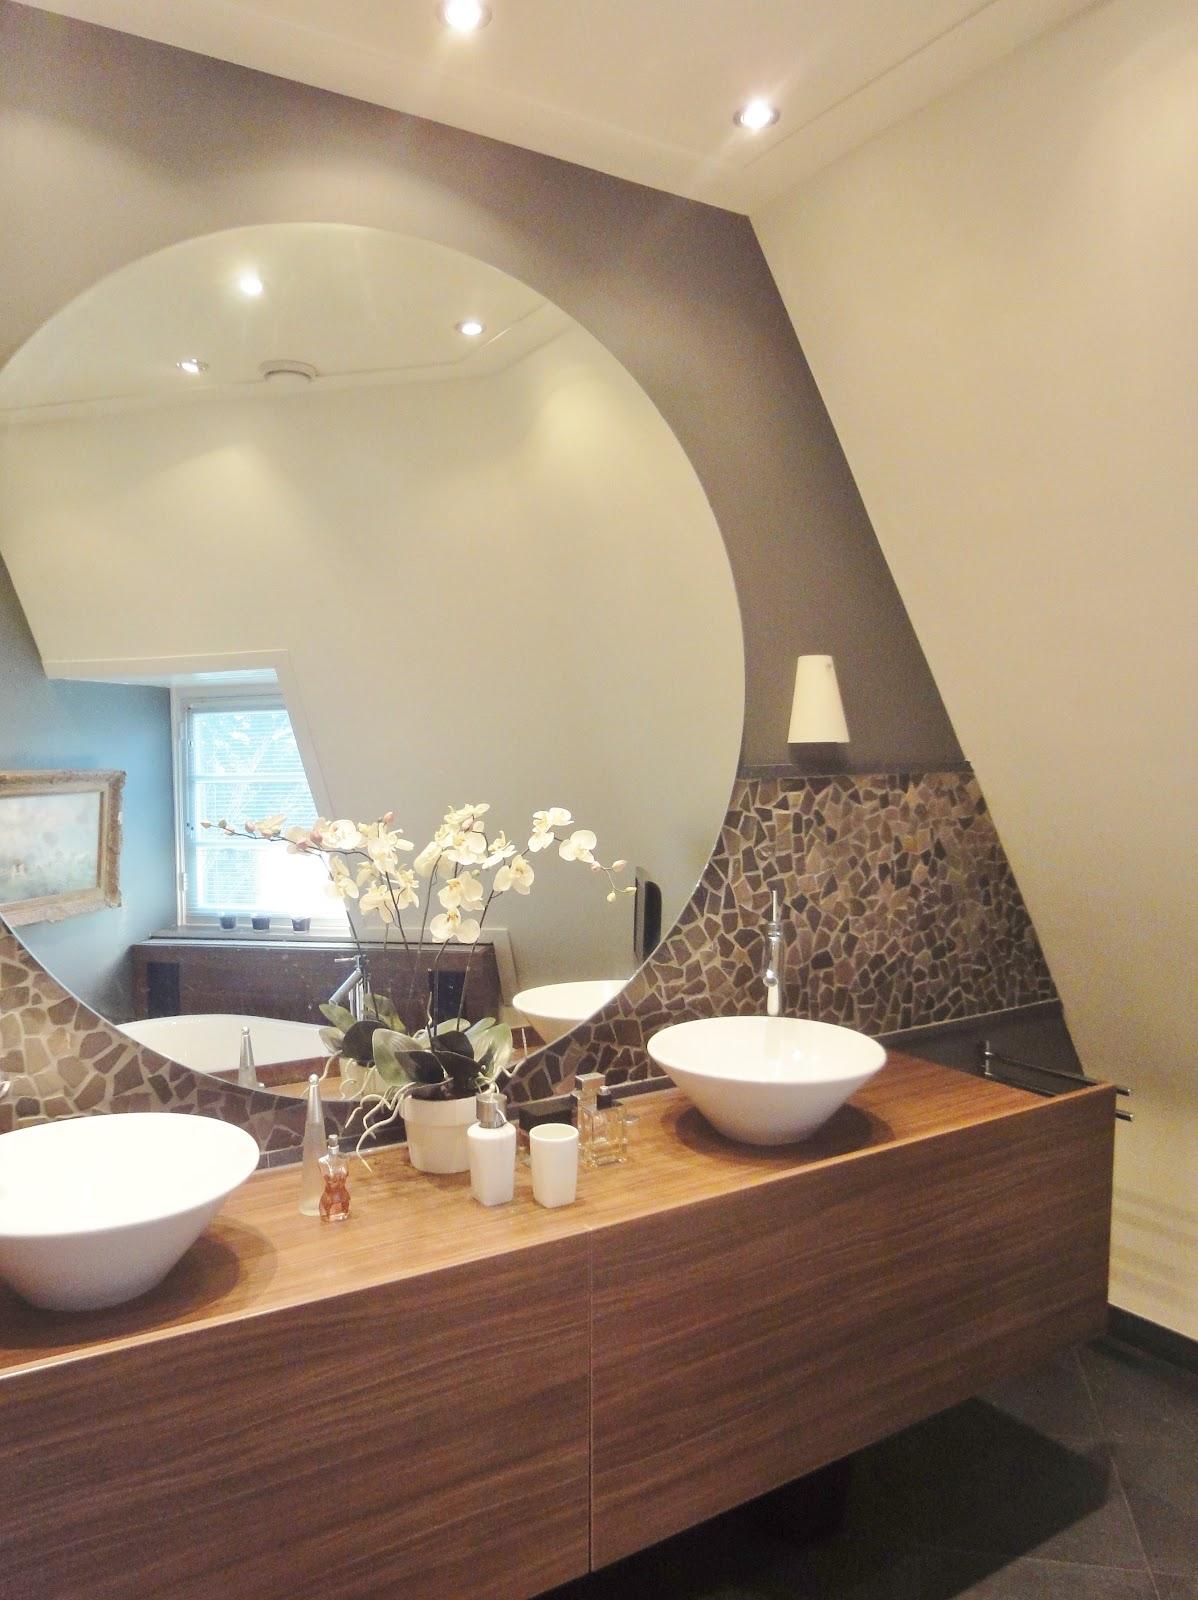 Arnoud herberts interieurarchitect ontwerp badkamermeubel for Grote muur spiegel